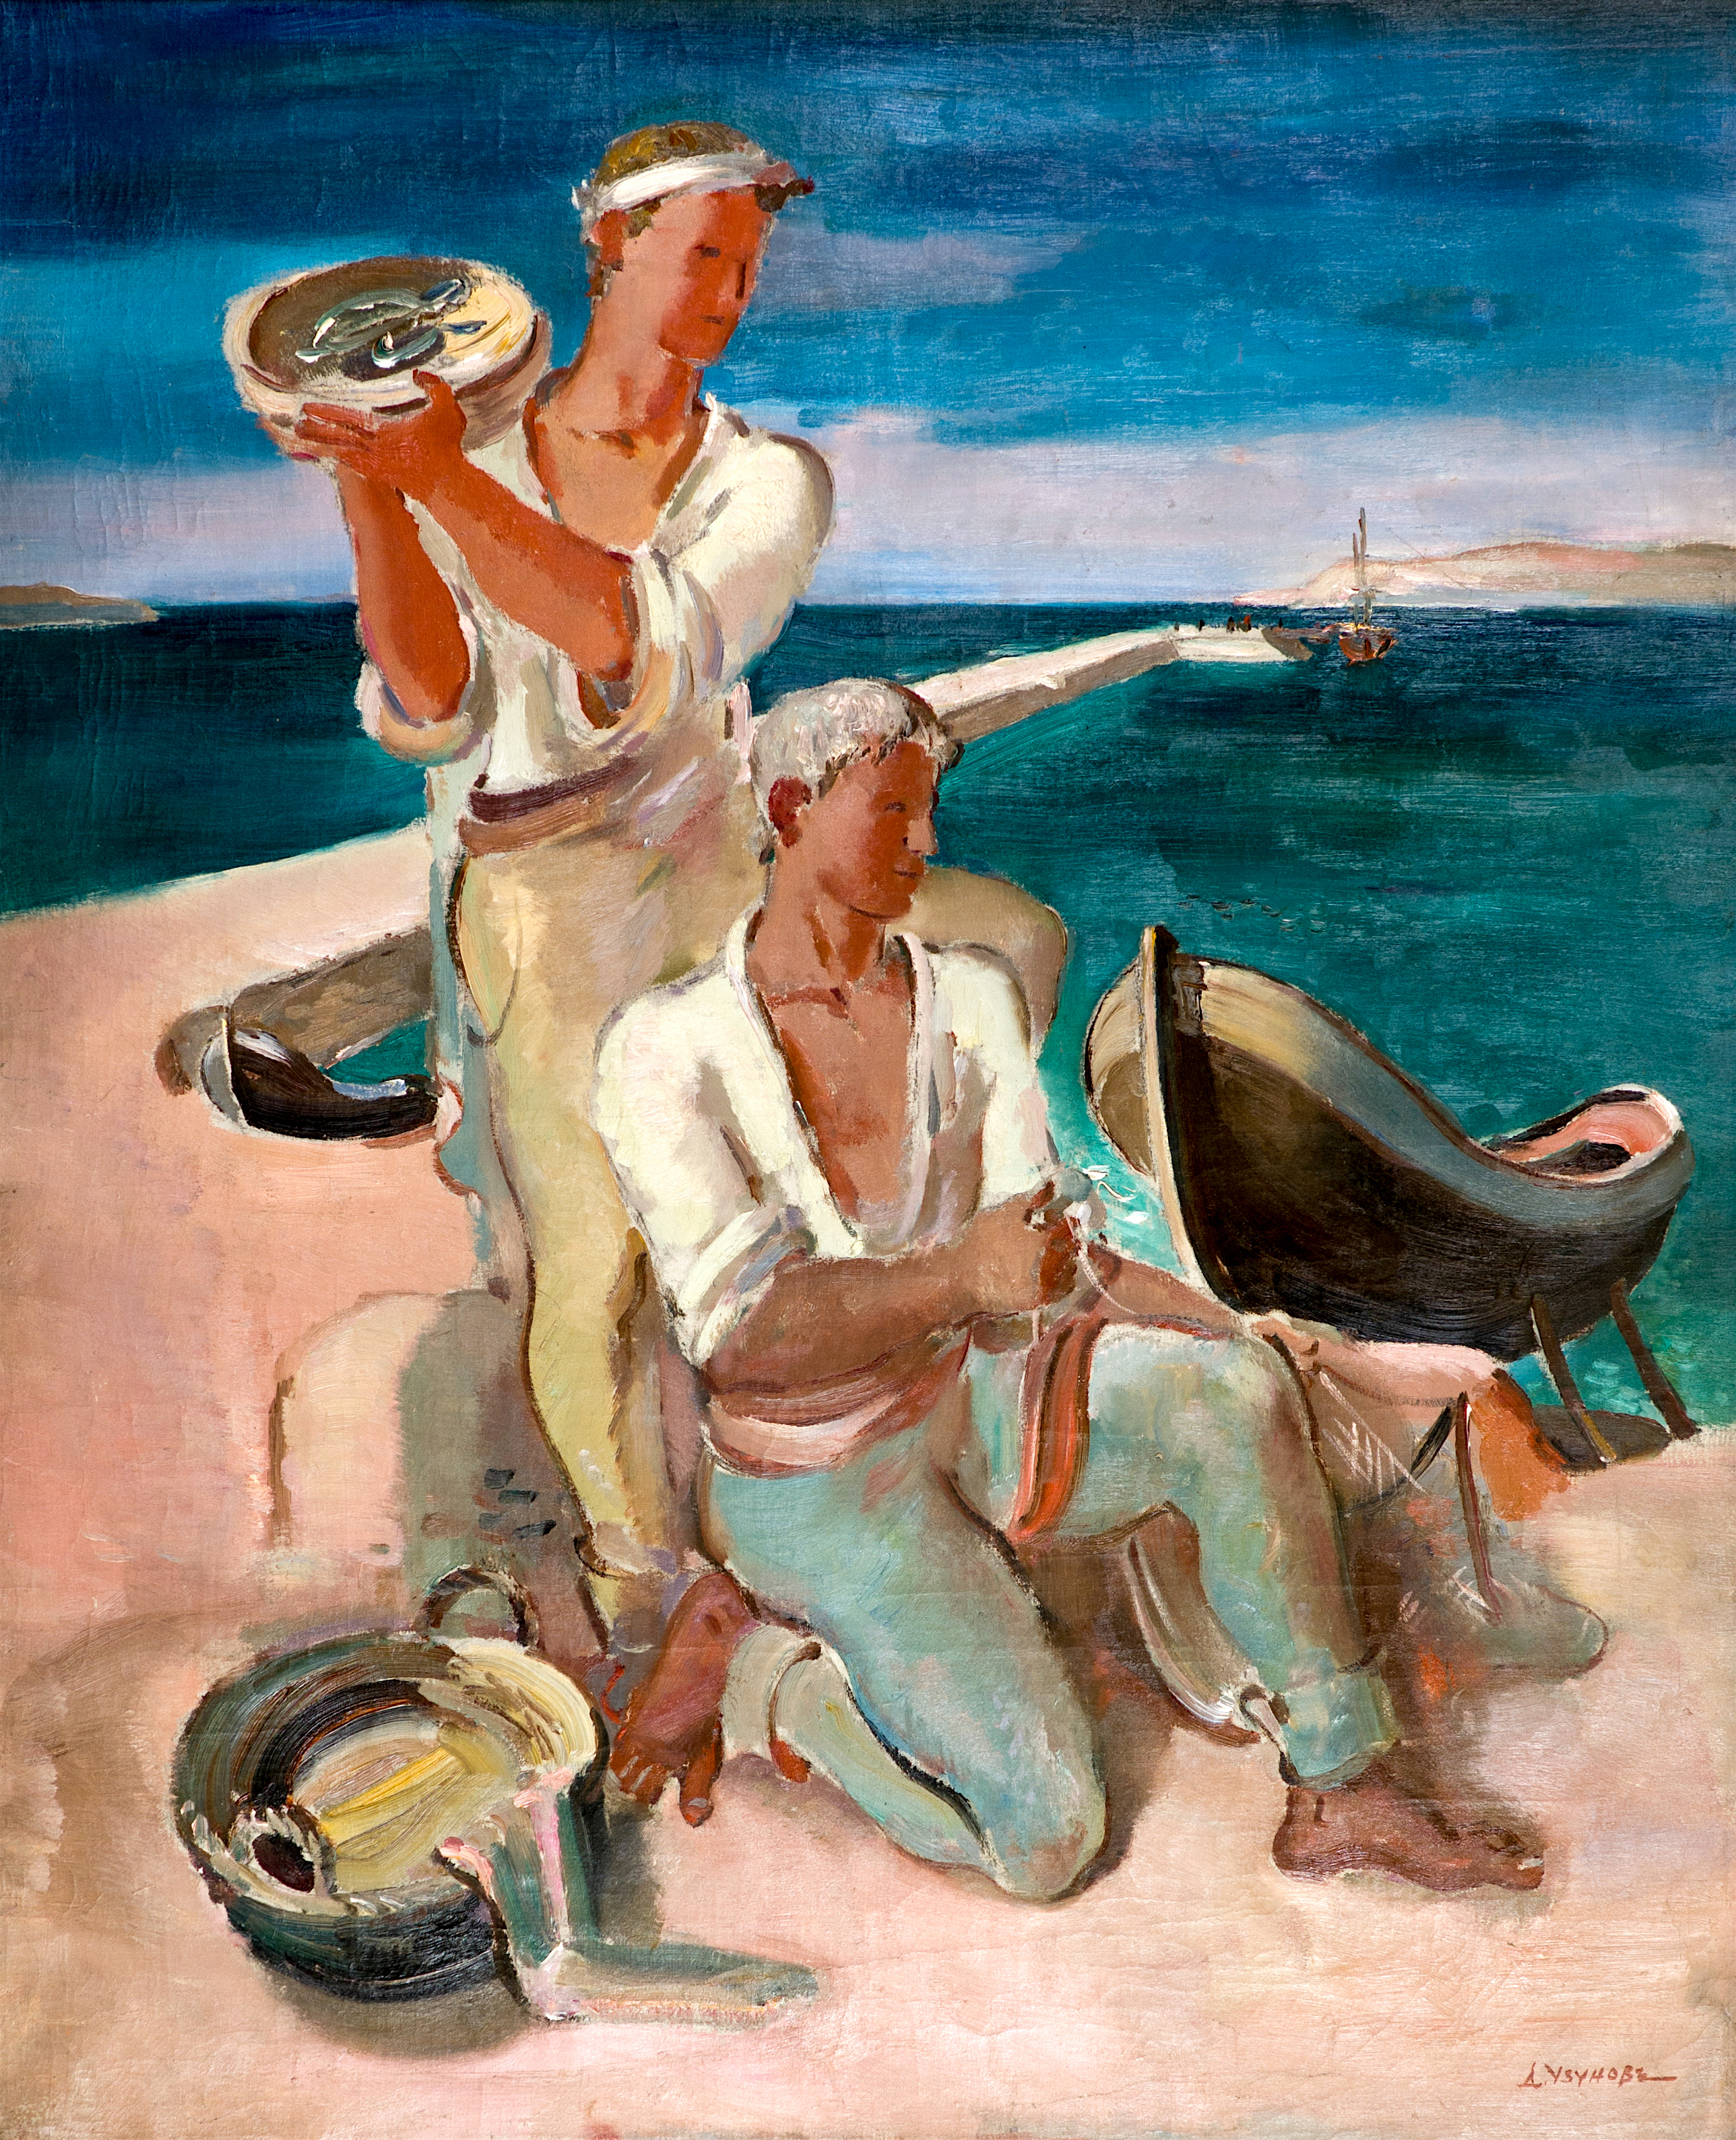 Дечко Узунов, Рибари (Le Marines-Pechers), 1938/1942г, м.б./пл., 100х81cm, Подпис, Монографирана, Многократни изложби